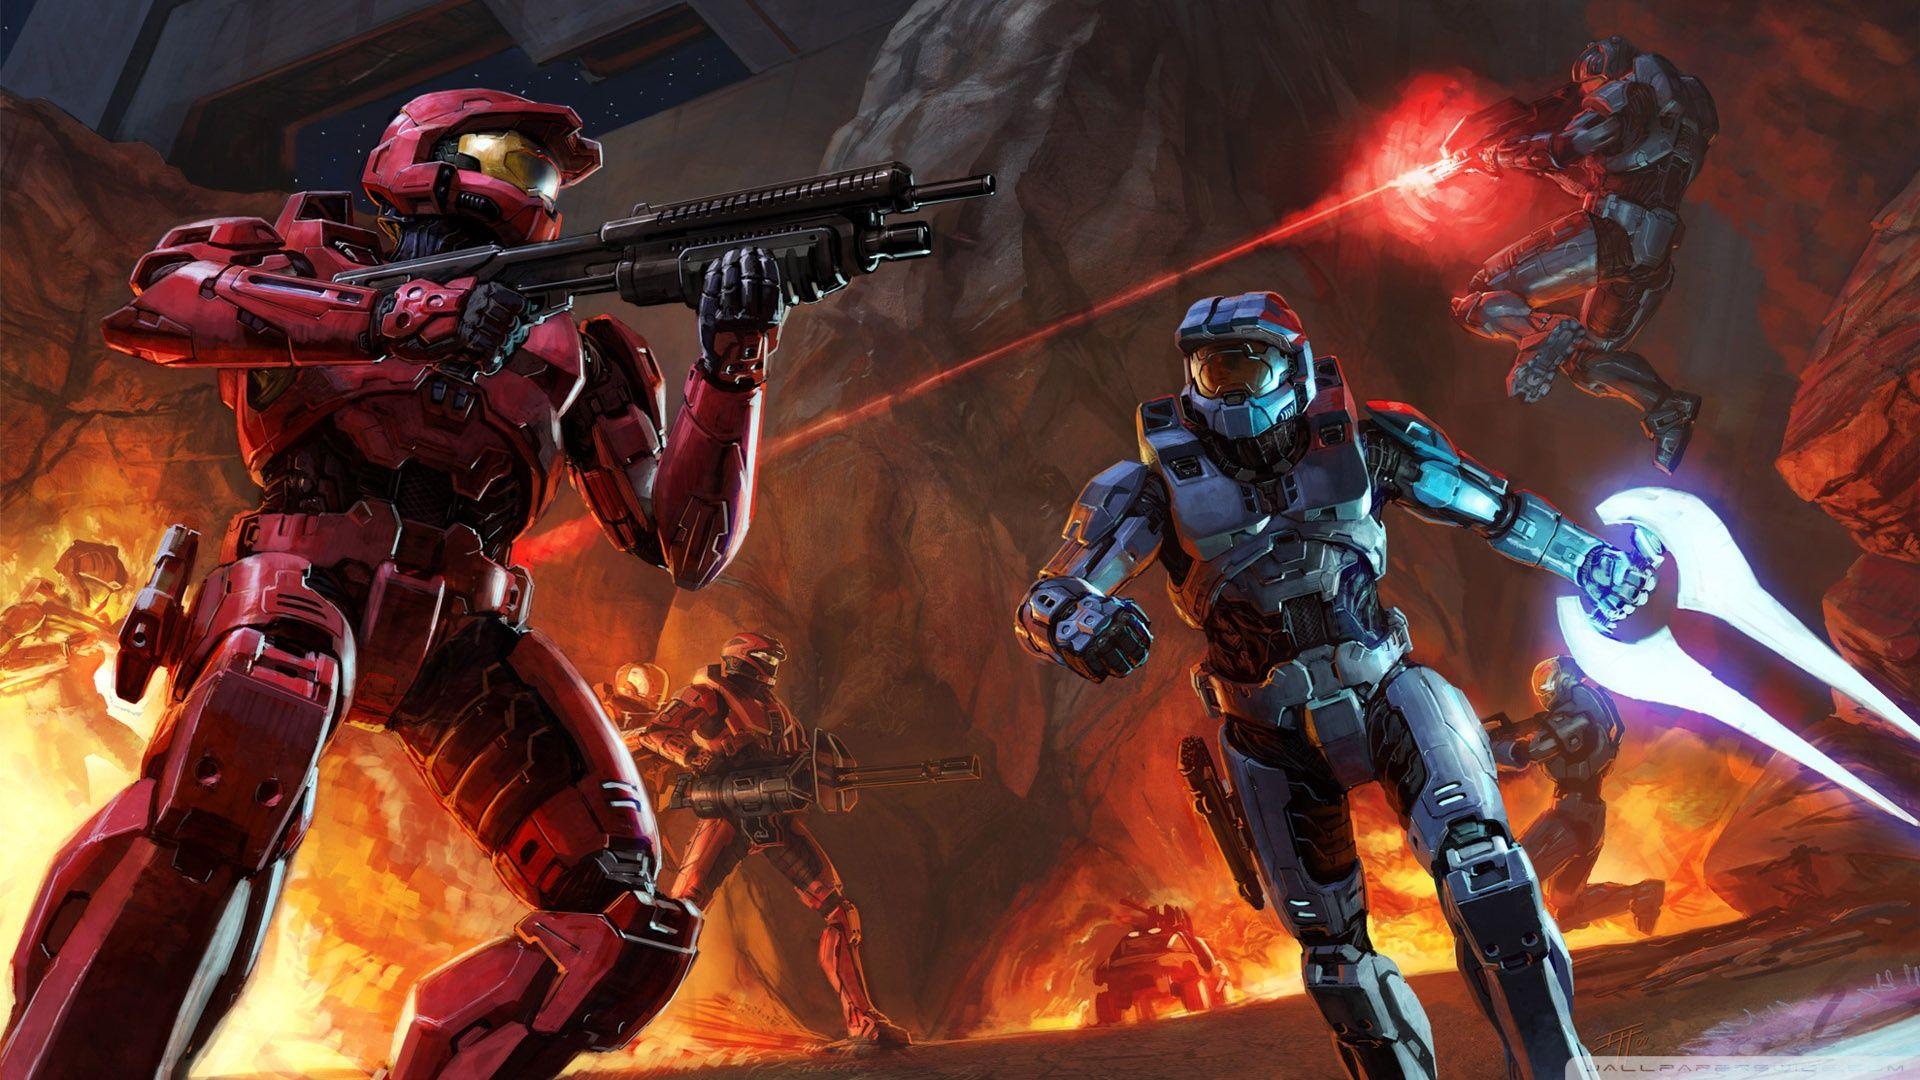 Halo 3 Multiplayer Concept Art 1920x1080 Halo 3 Red Vs Blue Halo